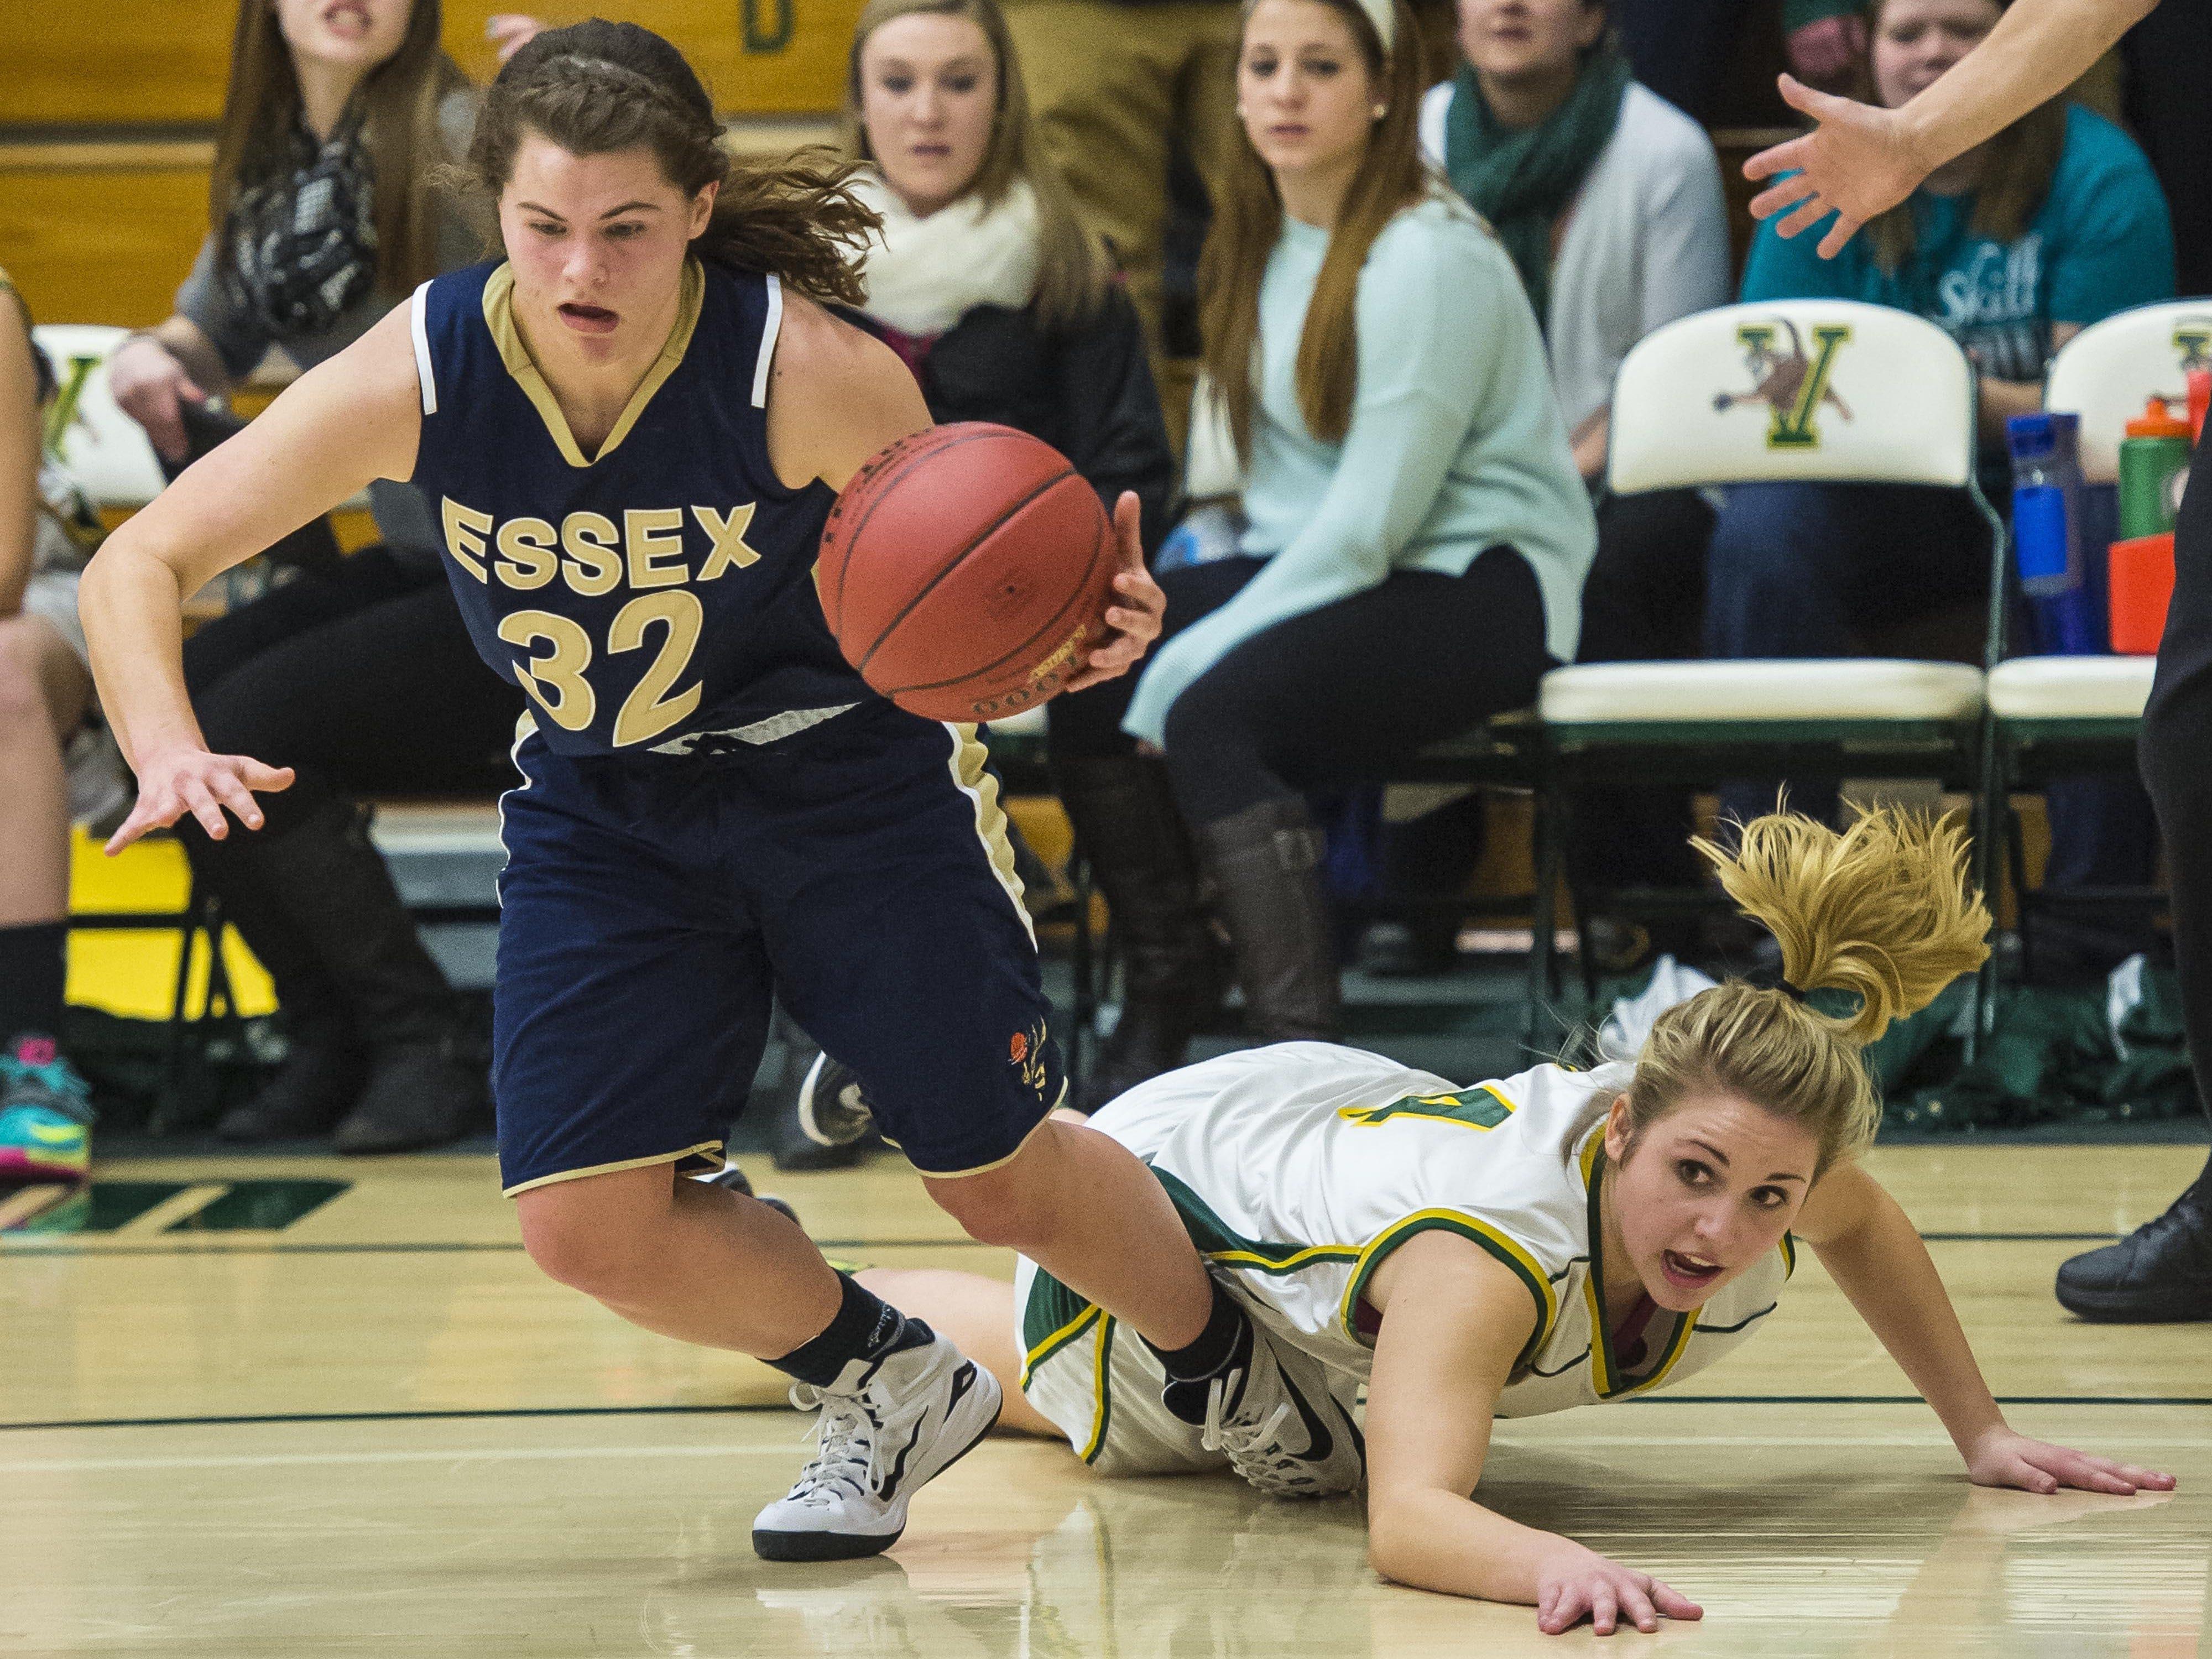 Essex's Mychaela Harton (left) evades pressure from BFA's Jillian Berno during the Division I high school girls basketball semifinals last year.